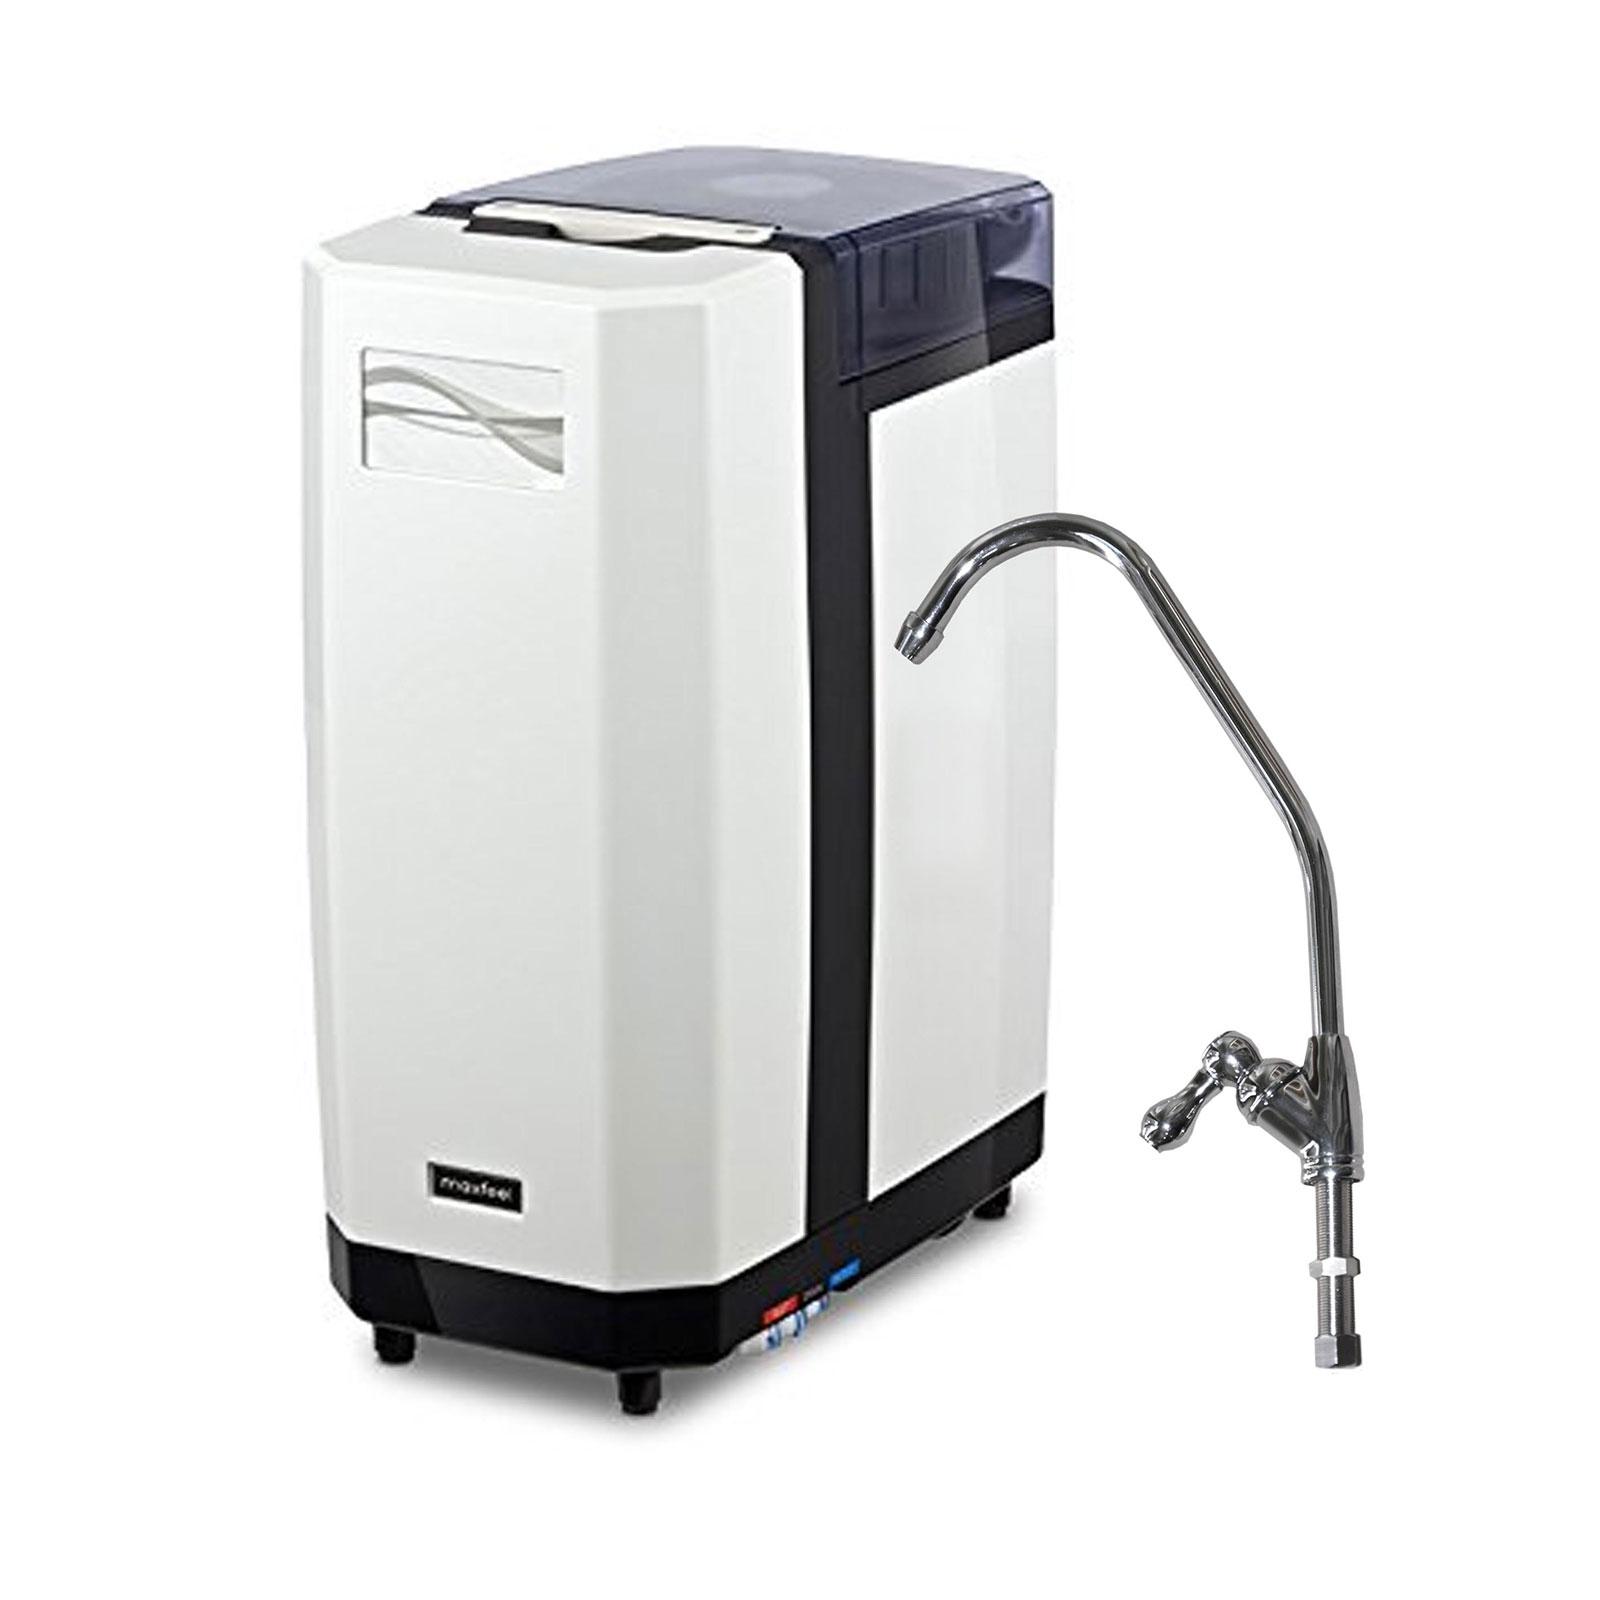 Aquaflow Direct Flow Umkehrosmose-Anlage Wasserfilter/Umkehrosmose ...